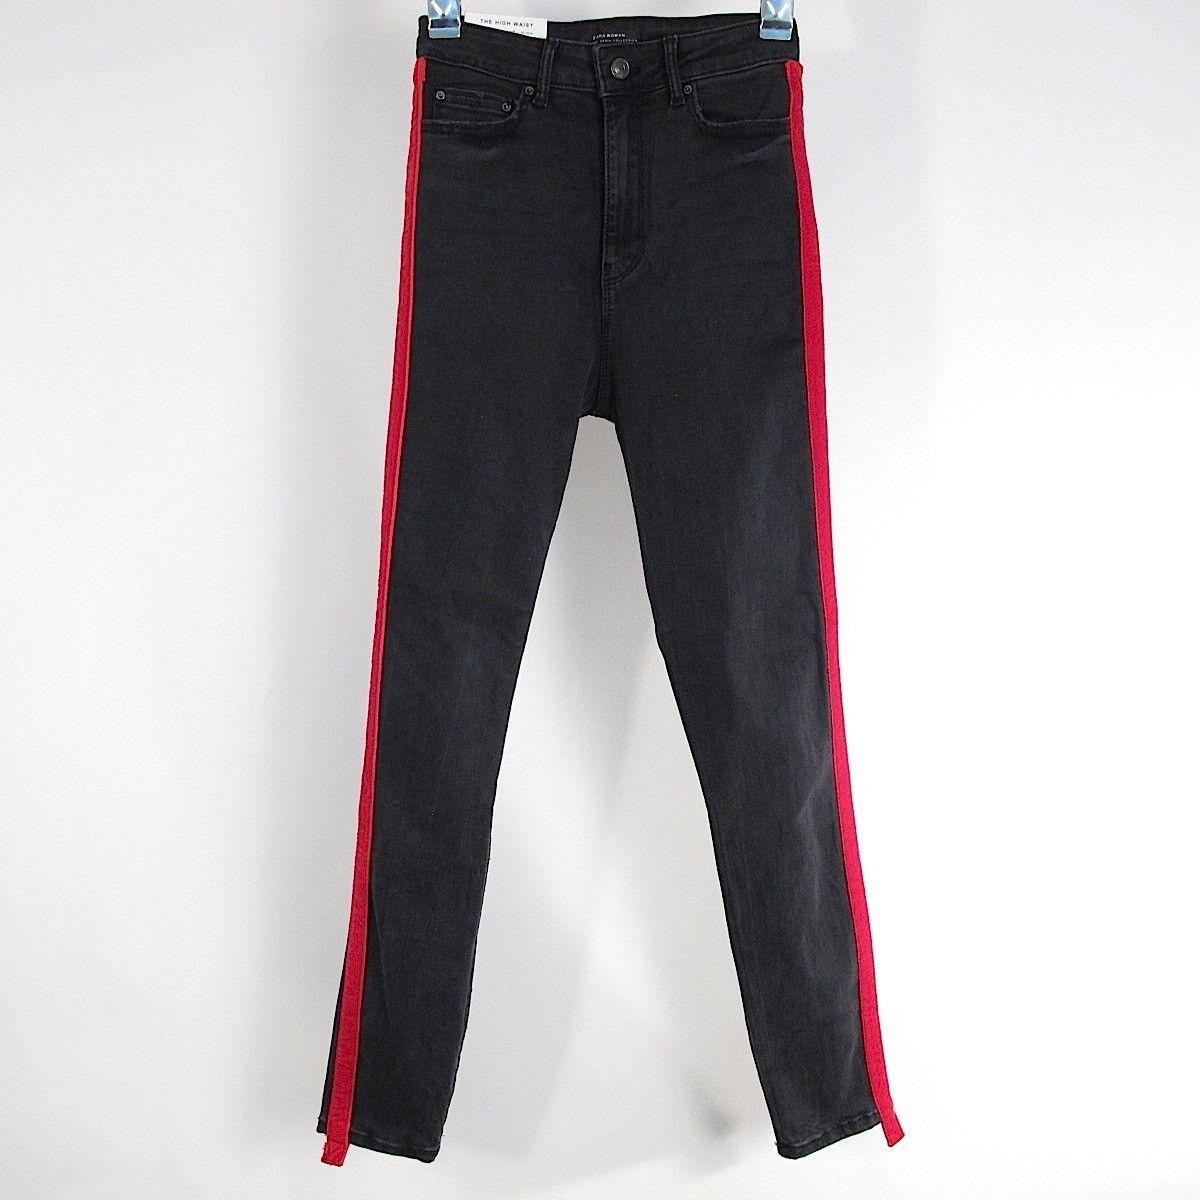 6f69c3aa NEW Zara Skinny Jeans Womens Size 2 Black High Waist Red Side Stripe ...